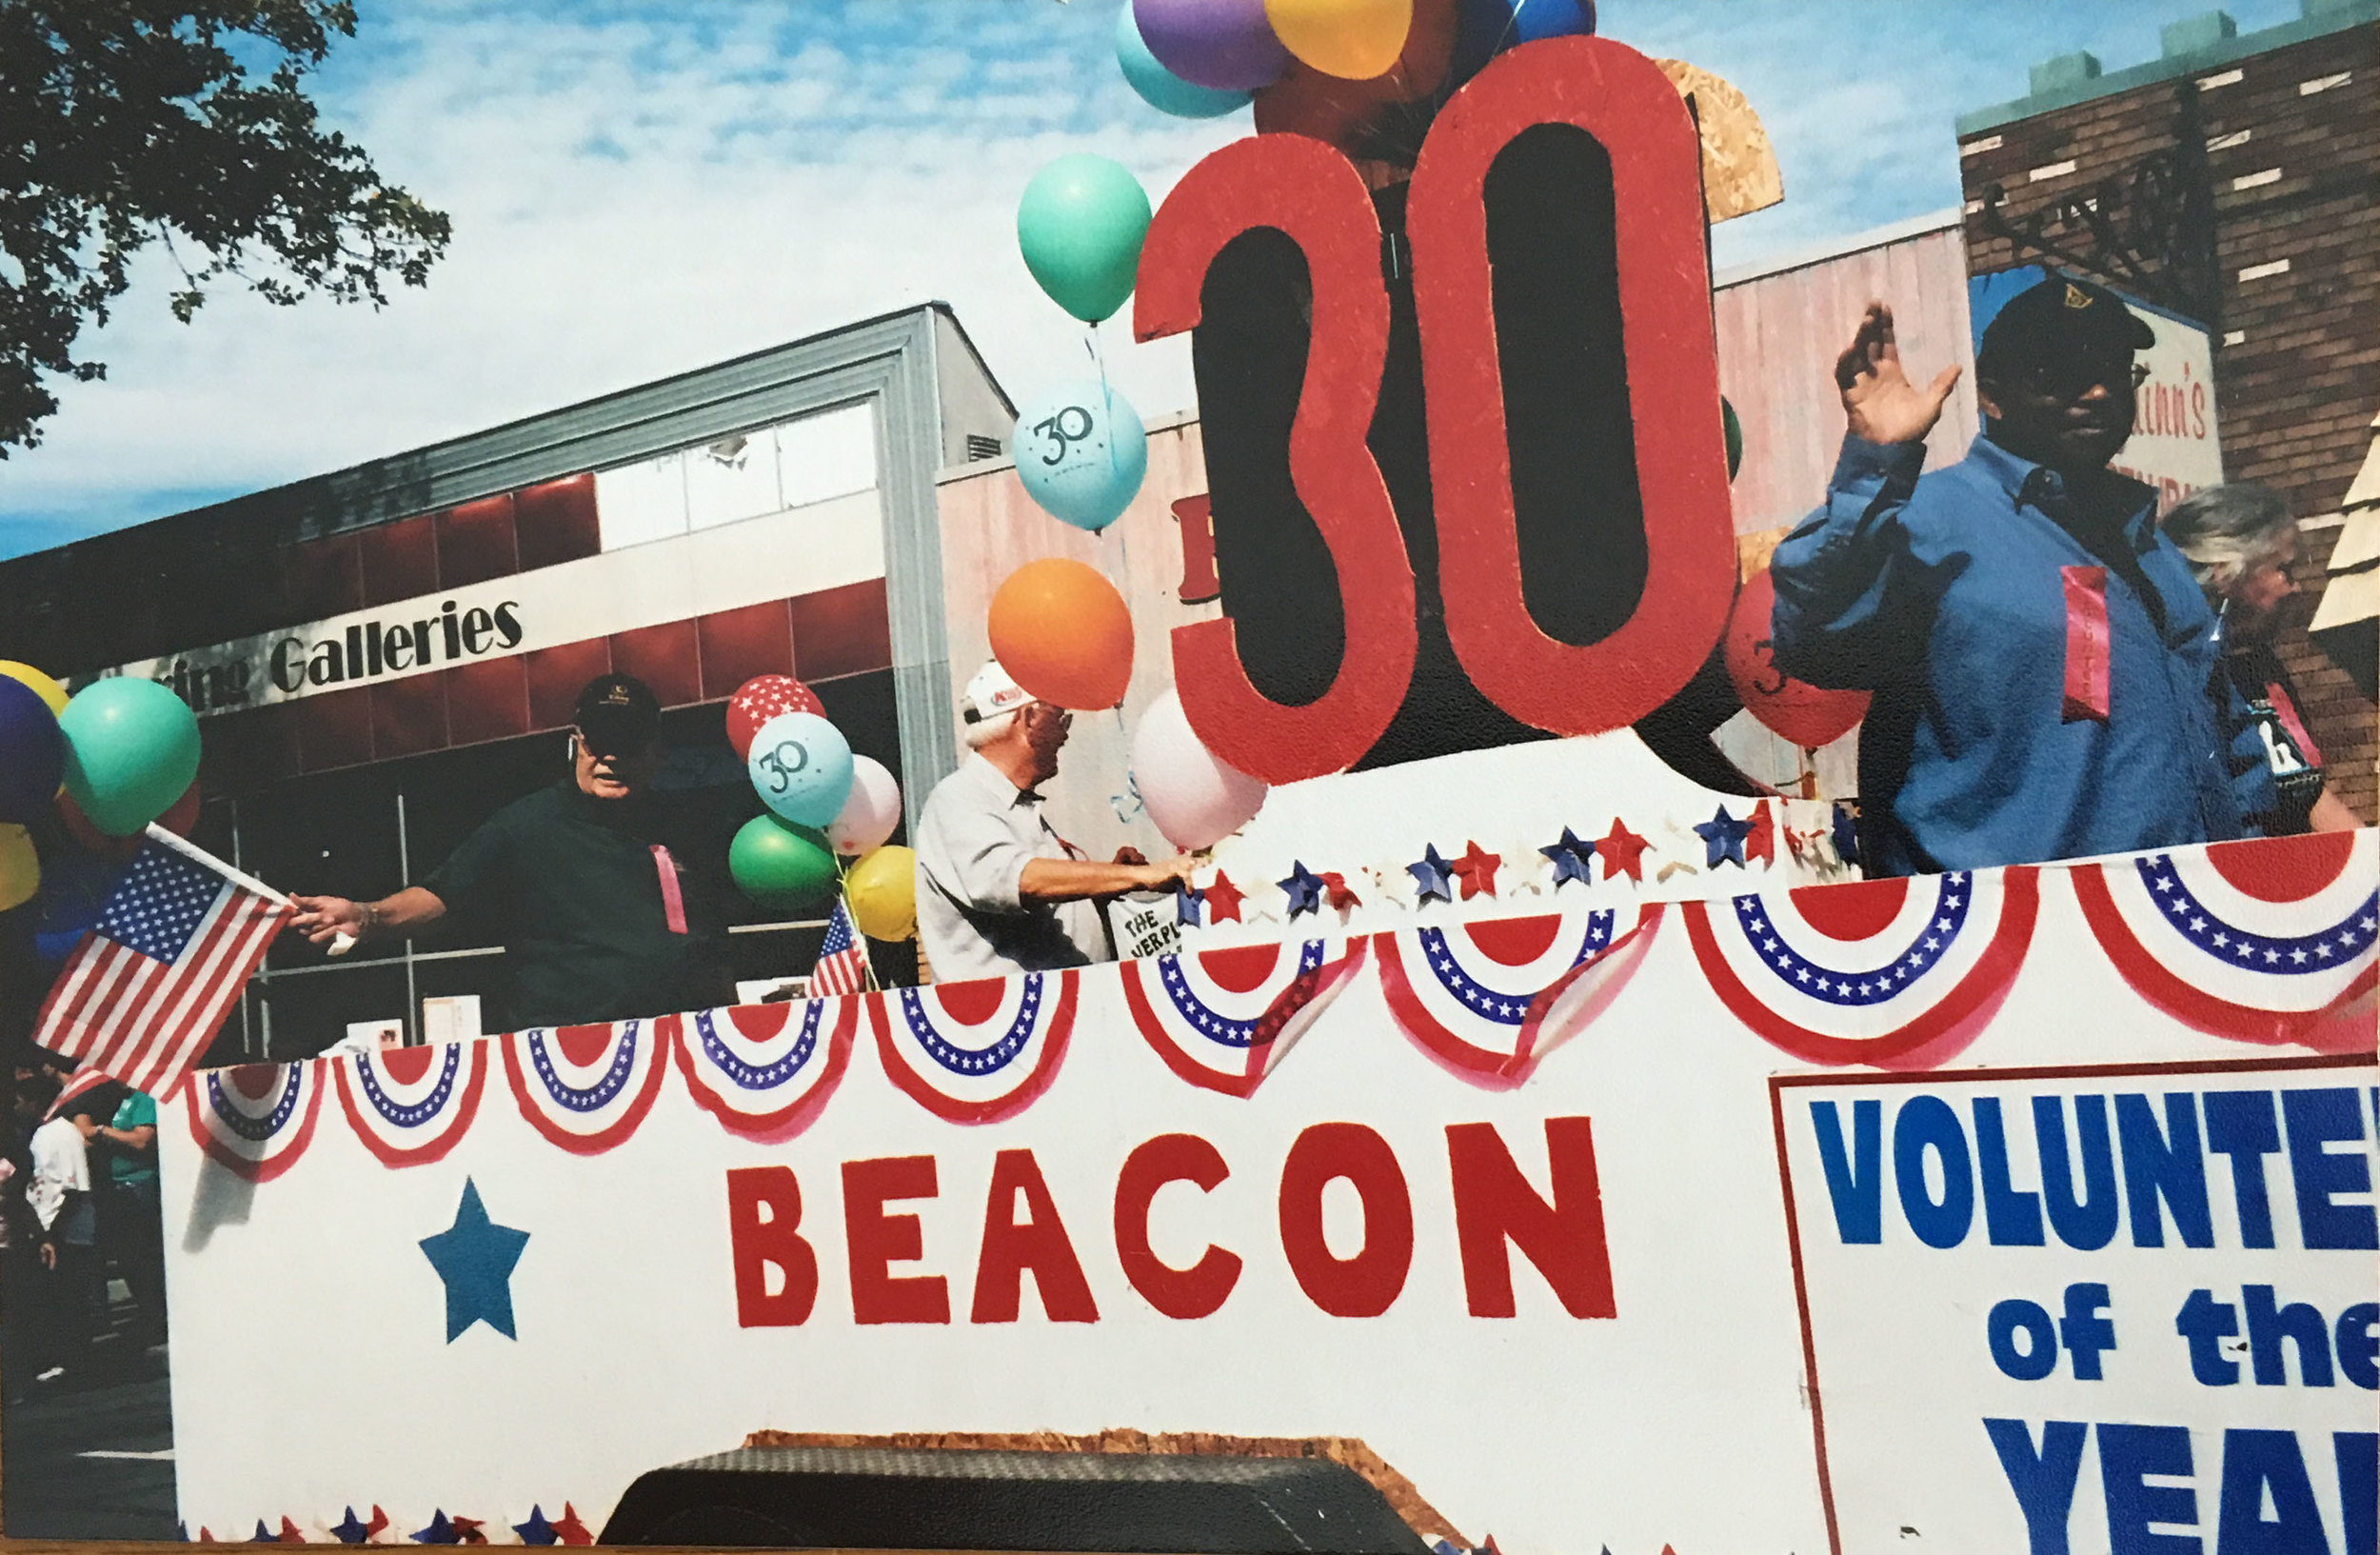 Spirit of Beacon Day 2007, courtesy Beacon Historical Society